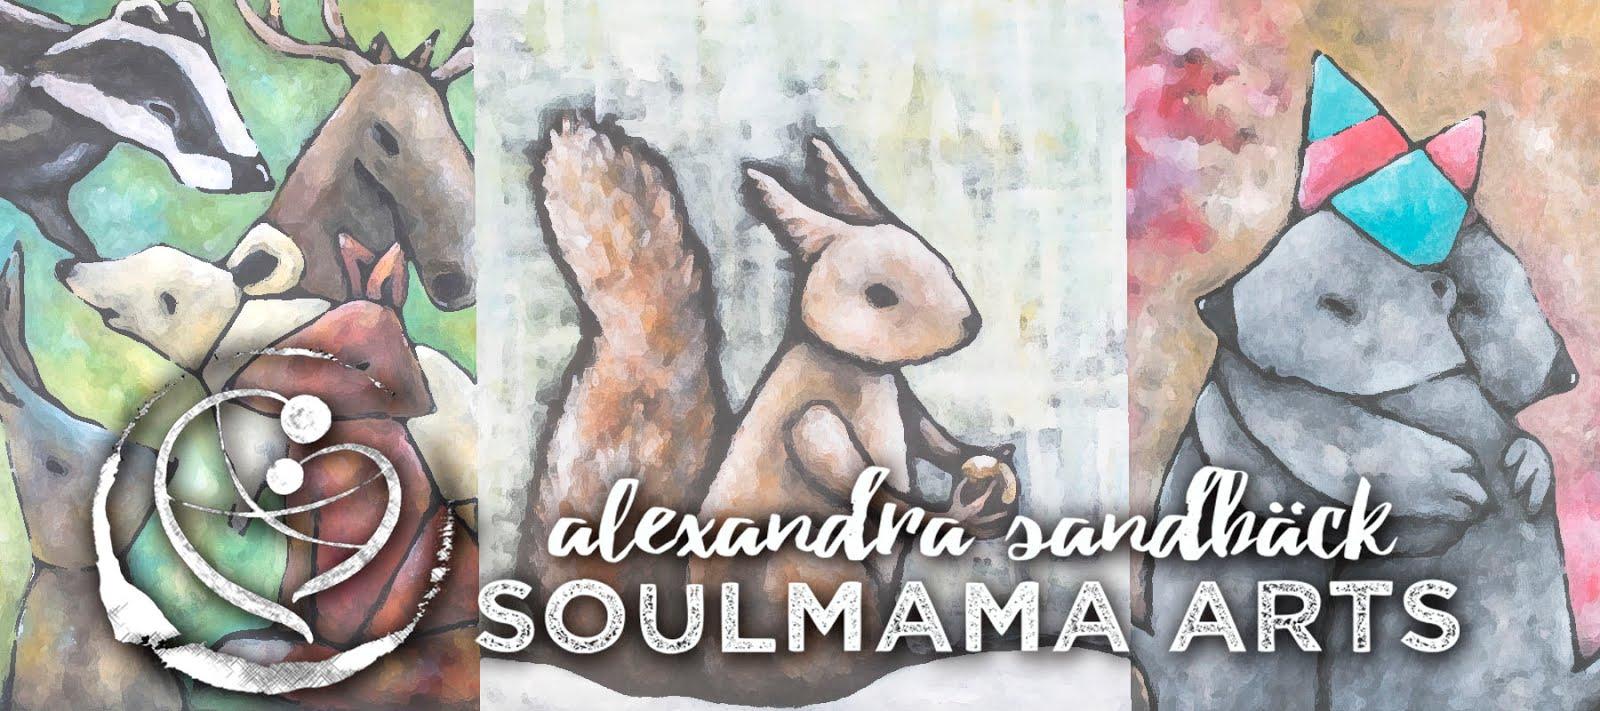 Soulmama Arts